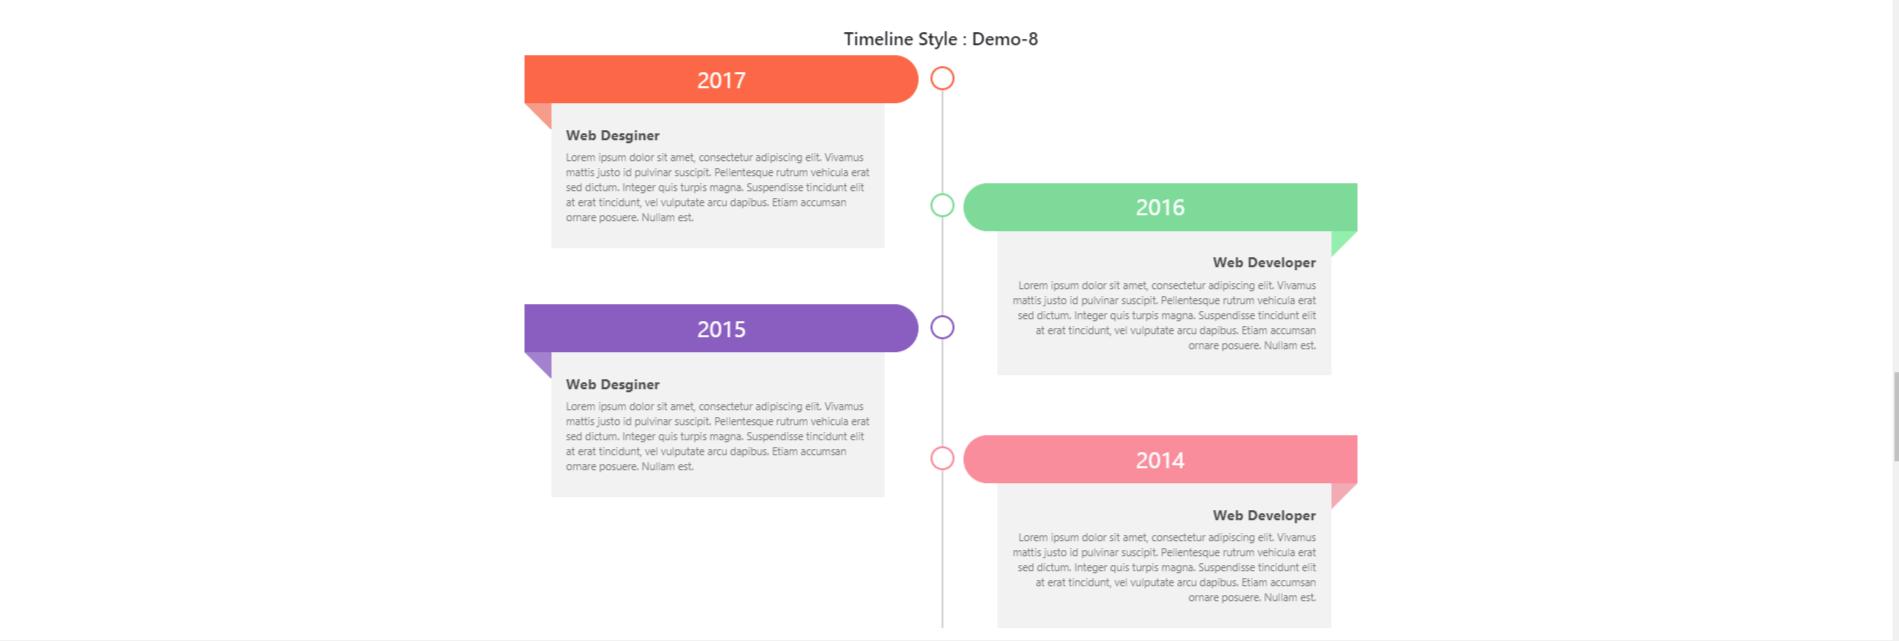 Cách Tạo Timeline Bootstrap